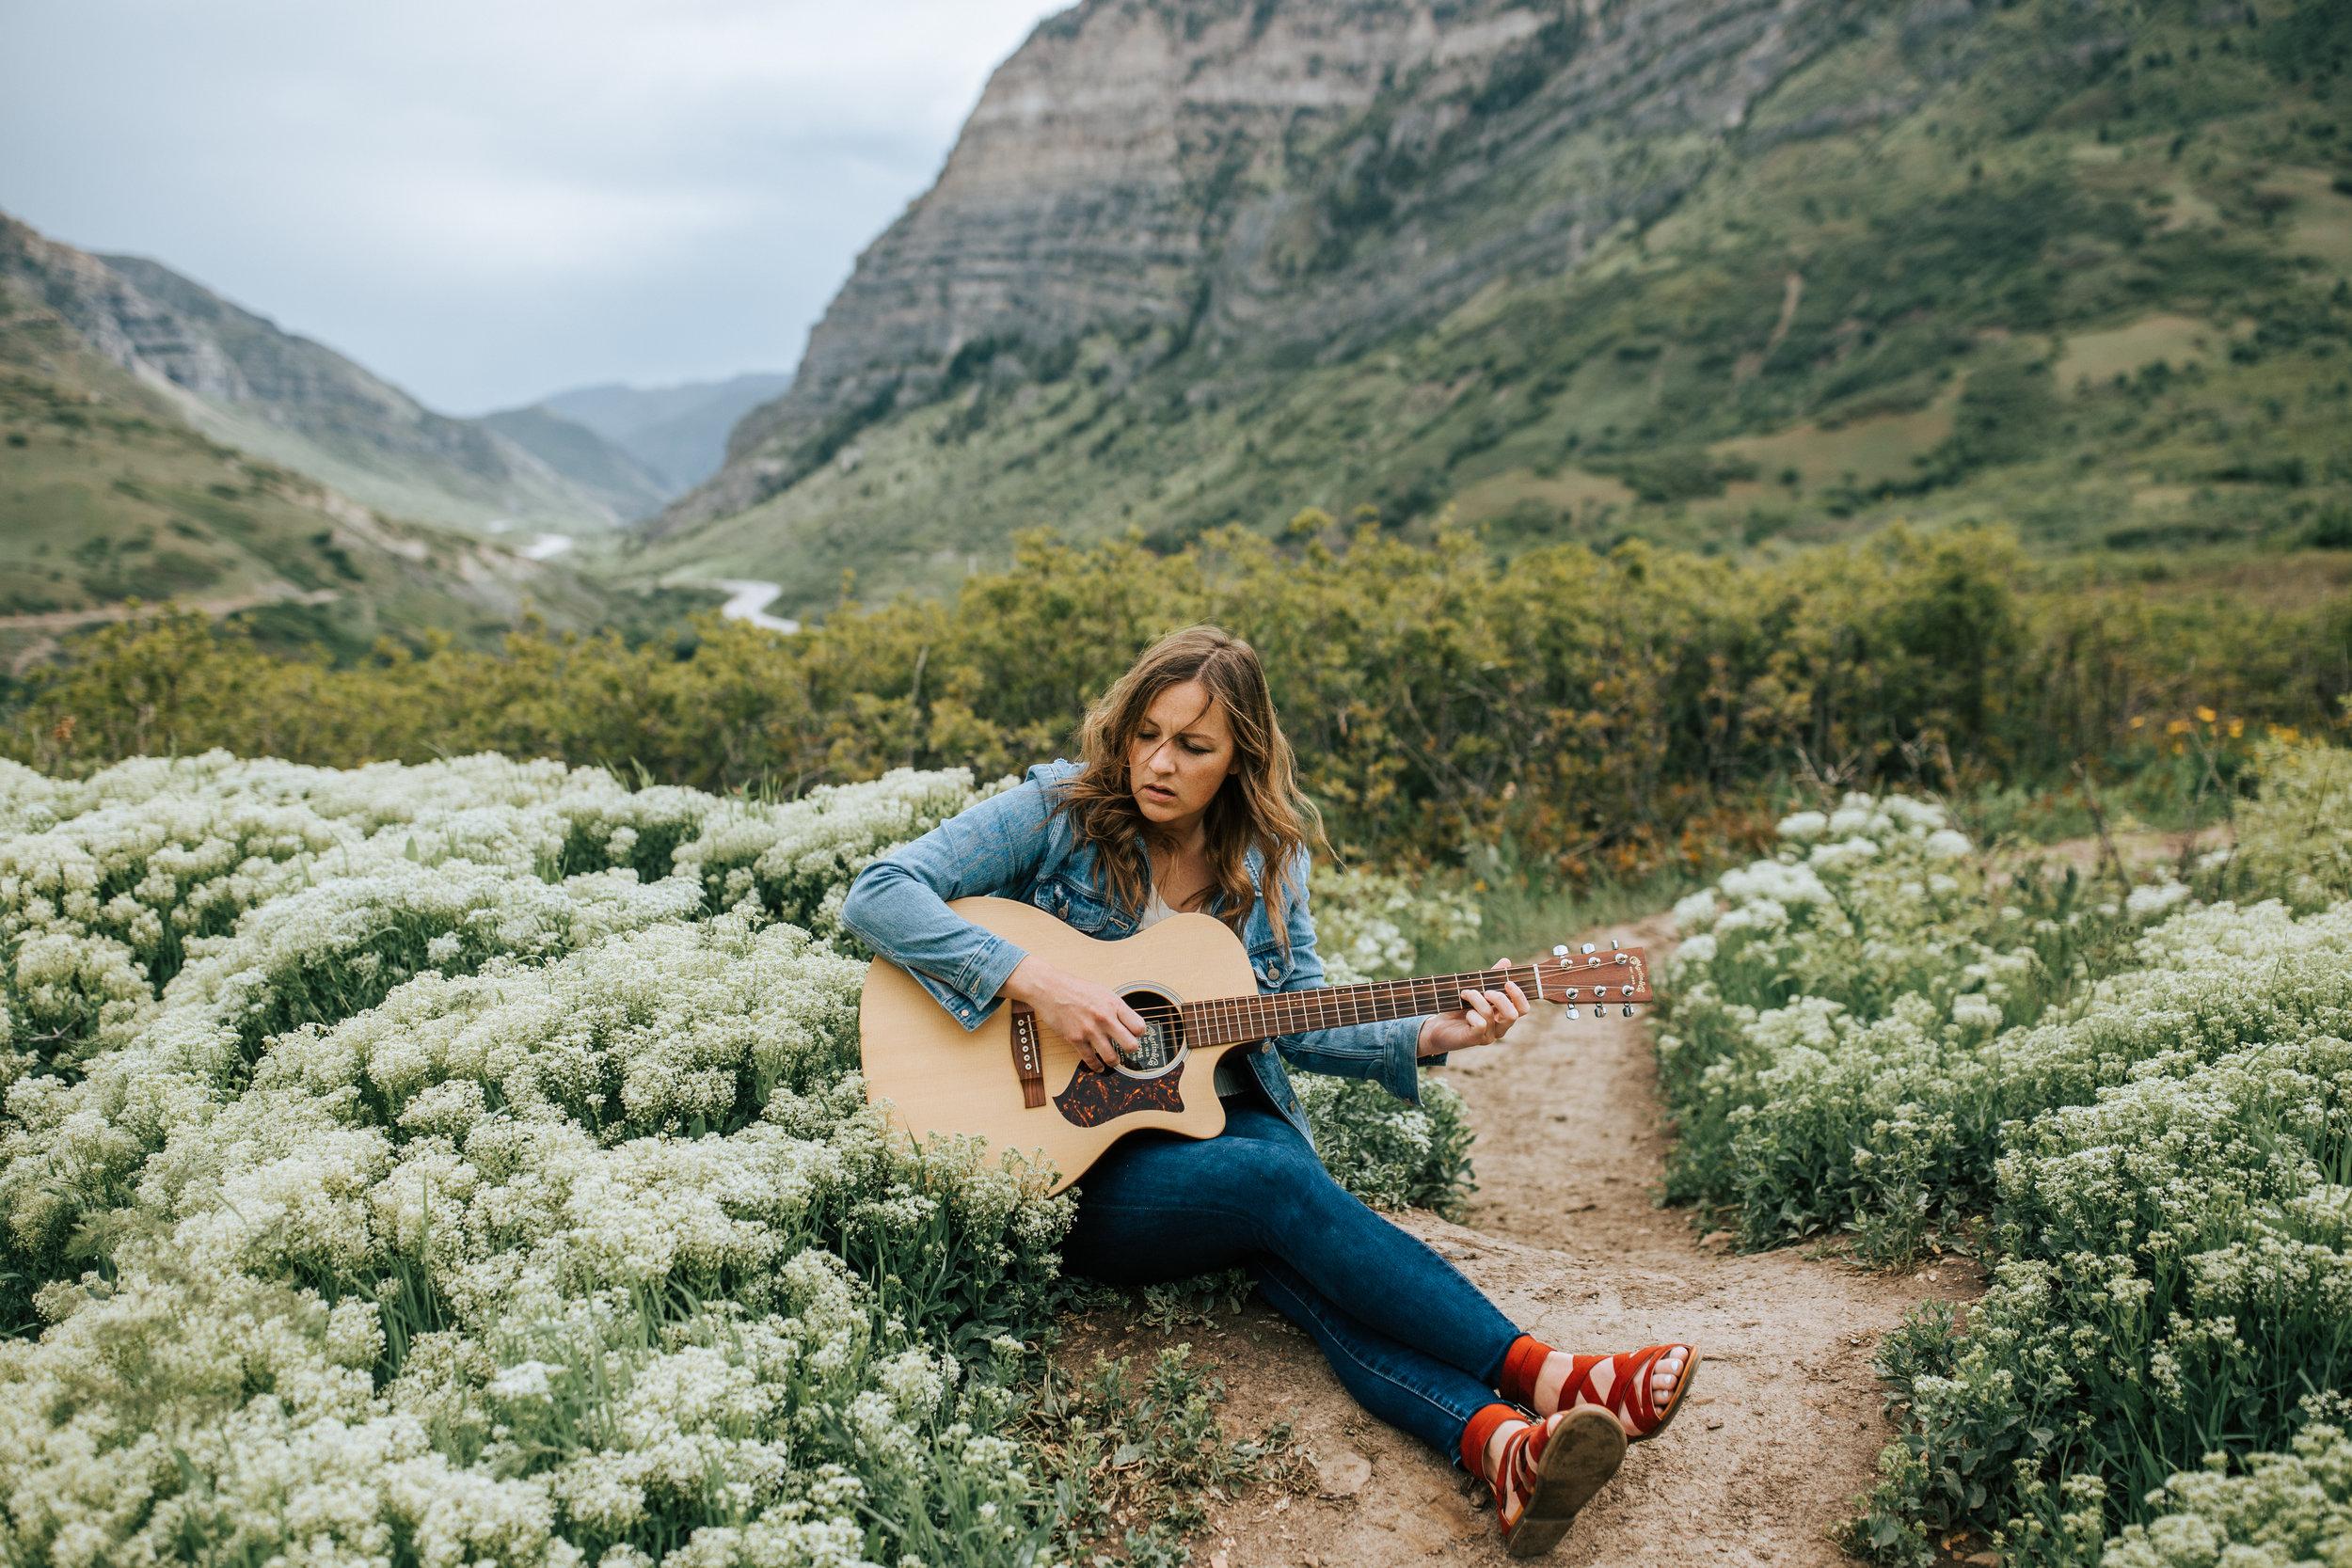 Windy Utah mountain wildflower field portraits guitar